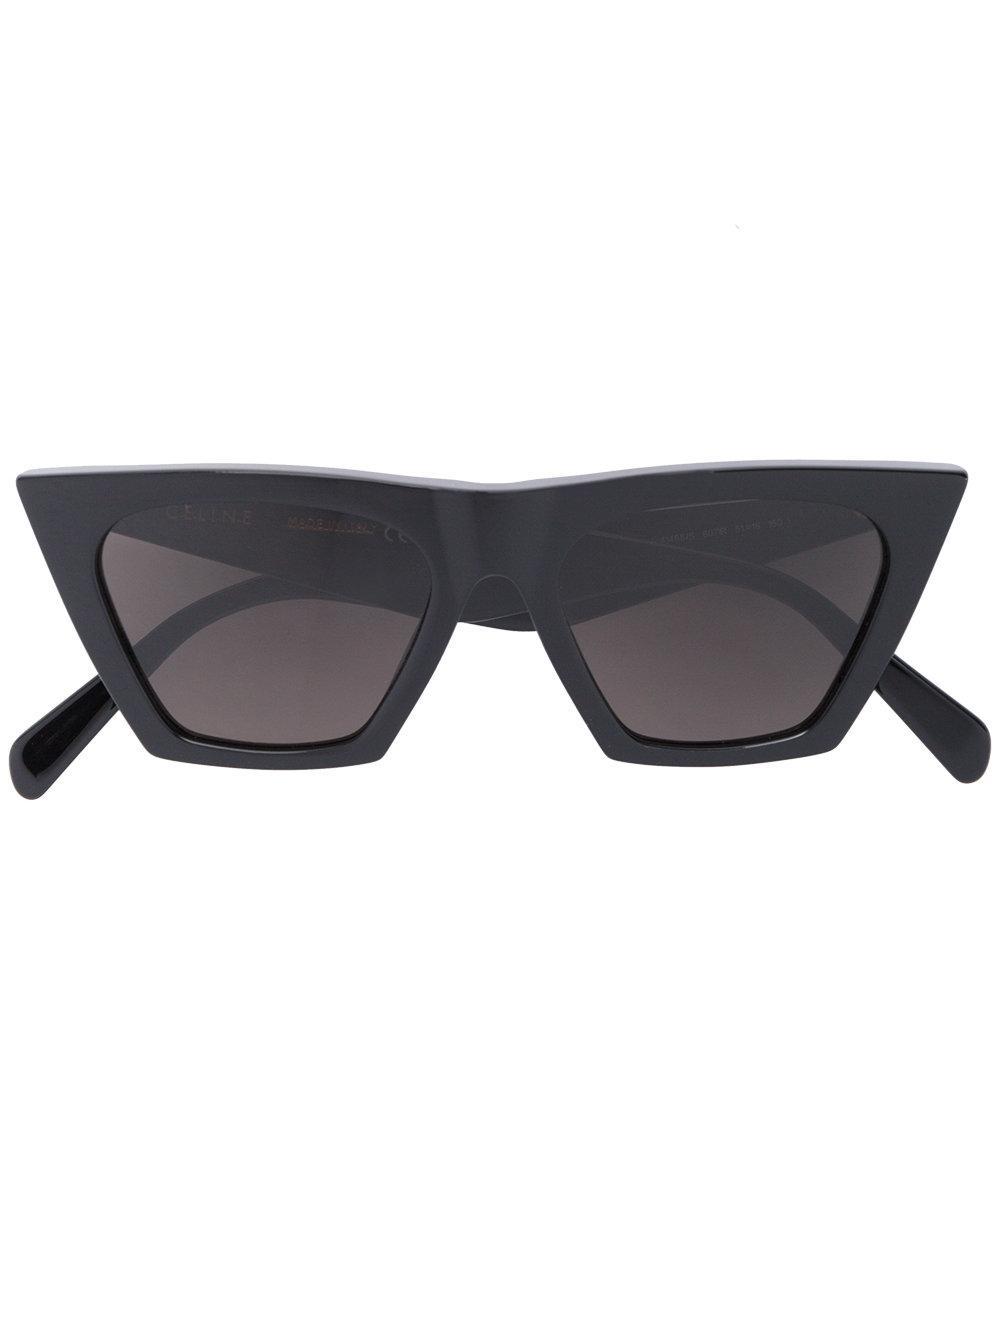 22a1d826a307 Celine Inspired Sunglasses Uk